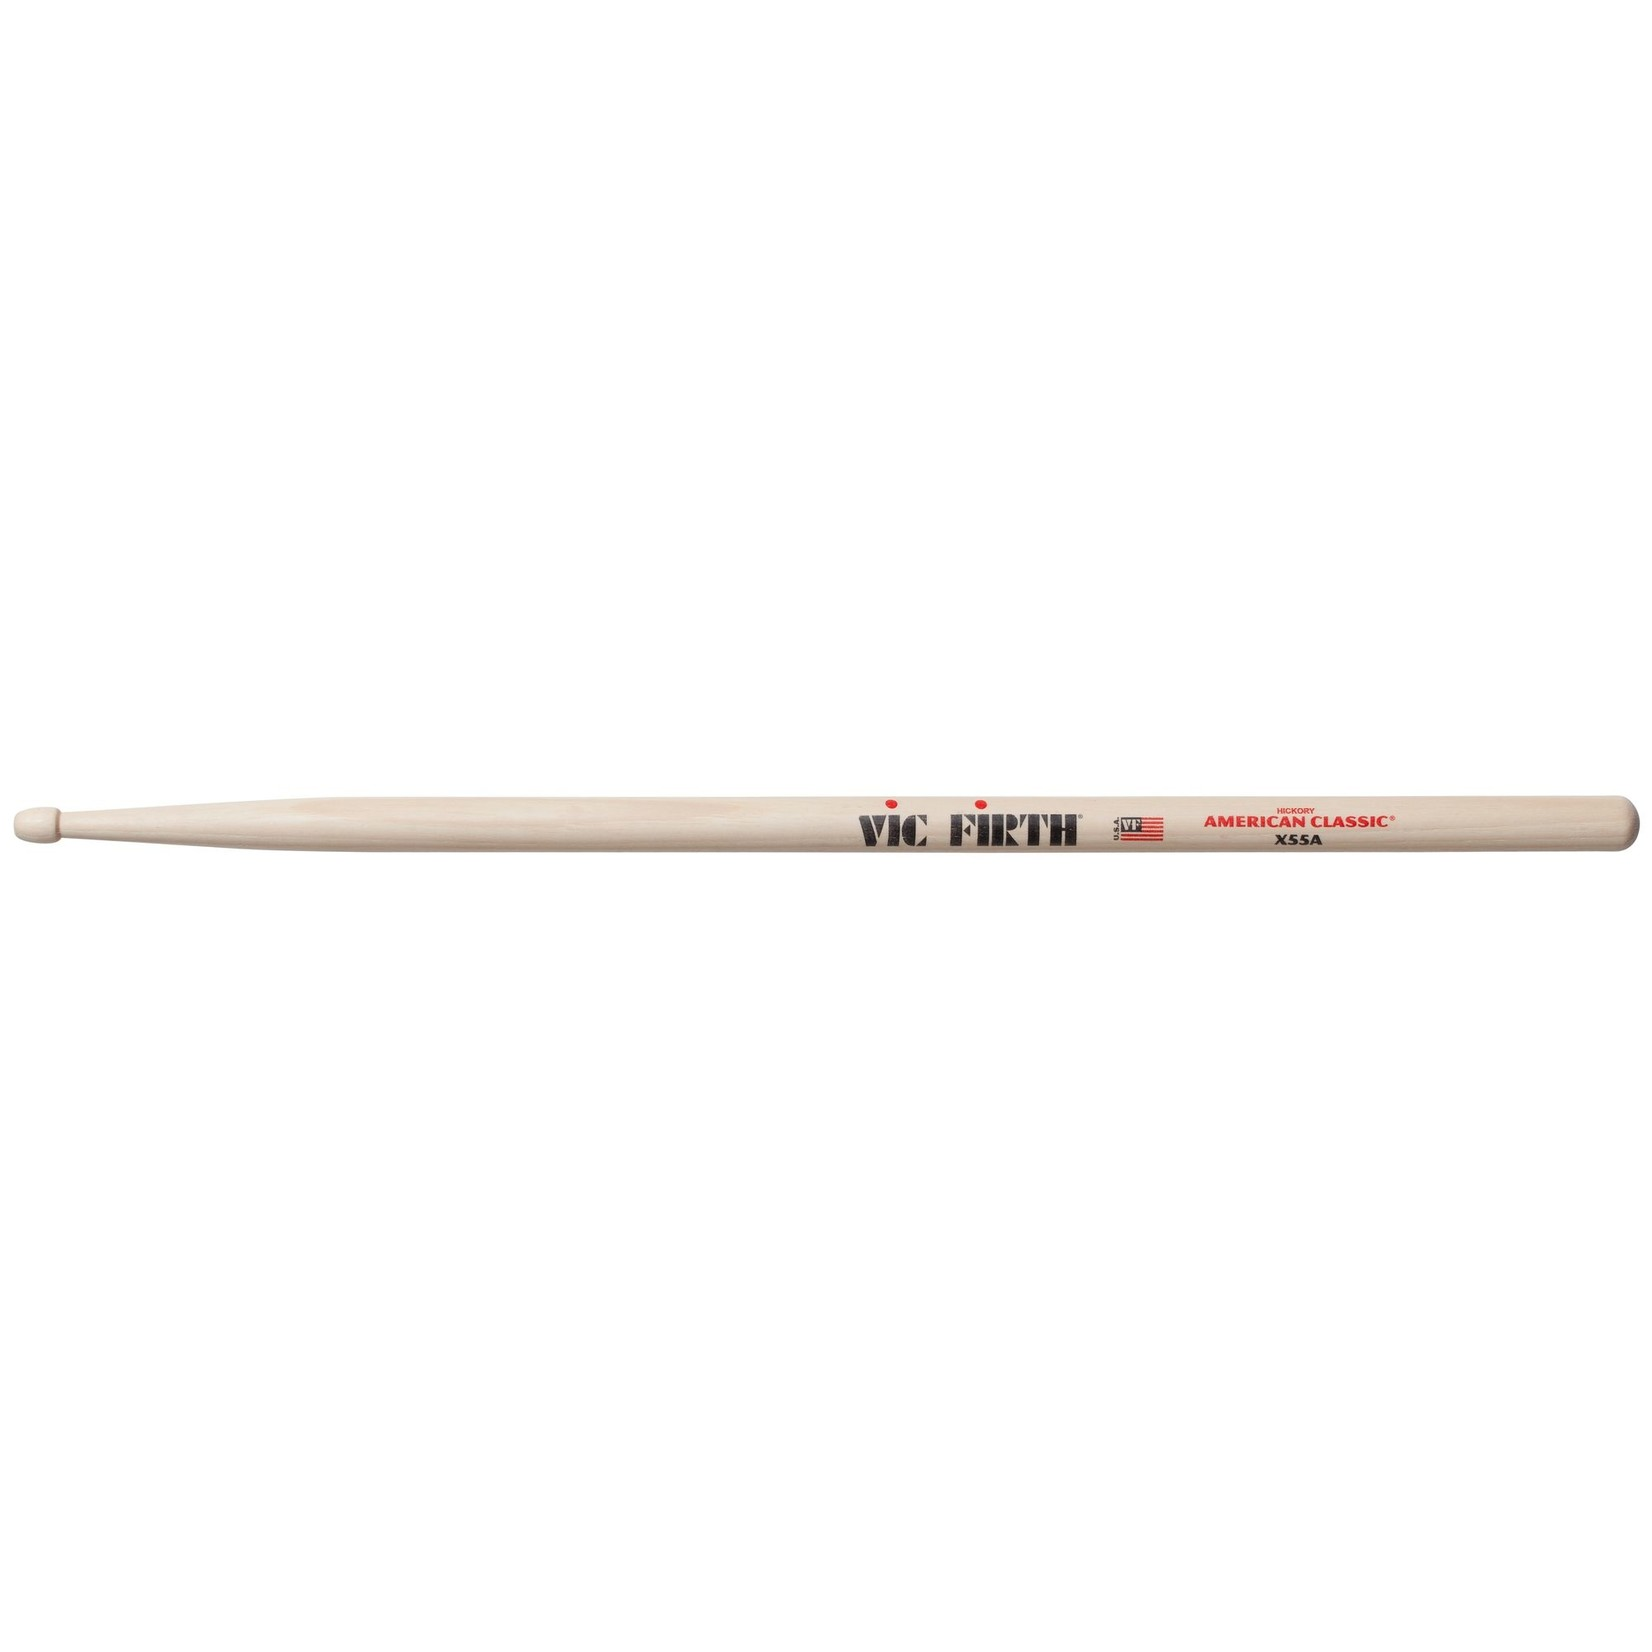 Vic Firth Vic Firth American Classic® X55A